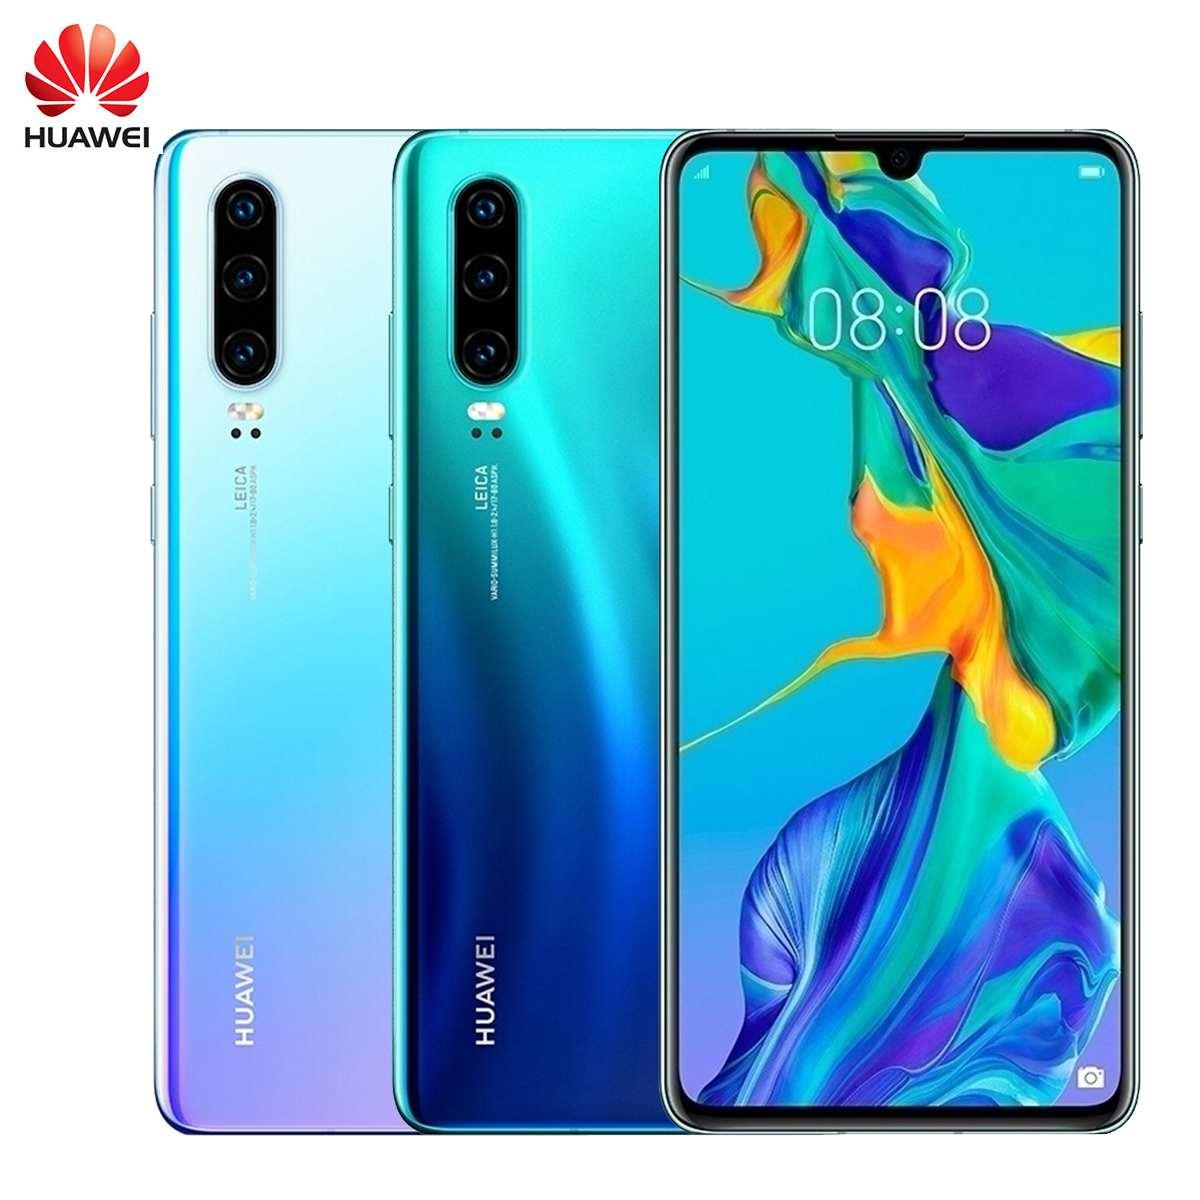 Smartphone d'origine HUAWEI P30 128GB + 8GB 6.1 pouces Kirin 980 Octa Core téléphone portable Android 9.0 double carte SIM 3650mAh 4 caméras